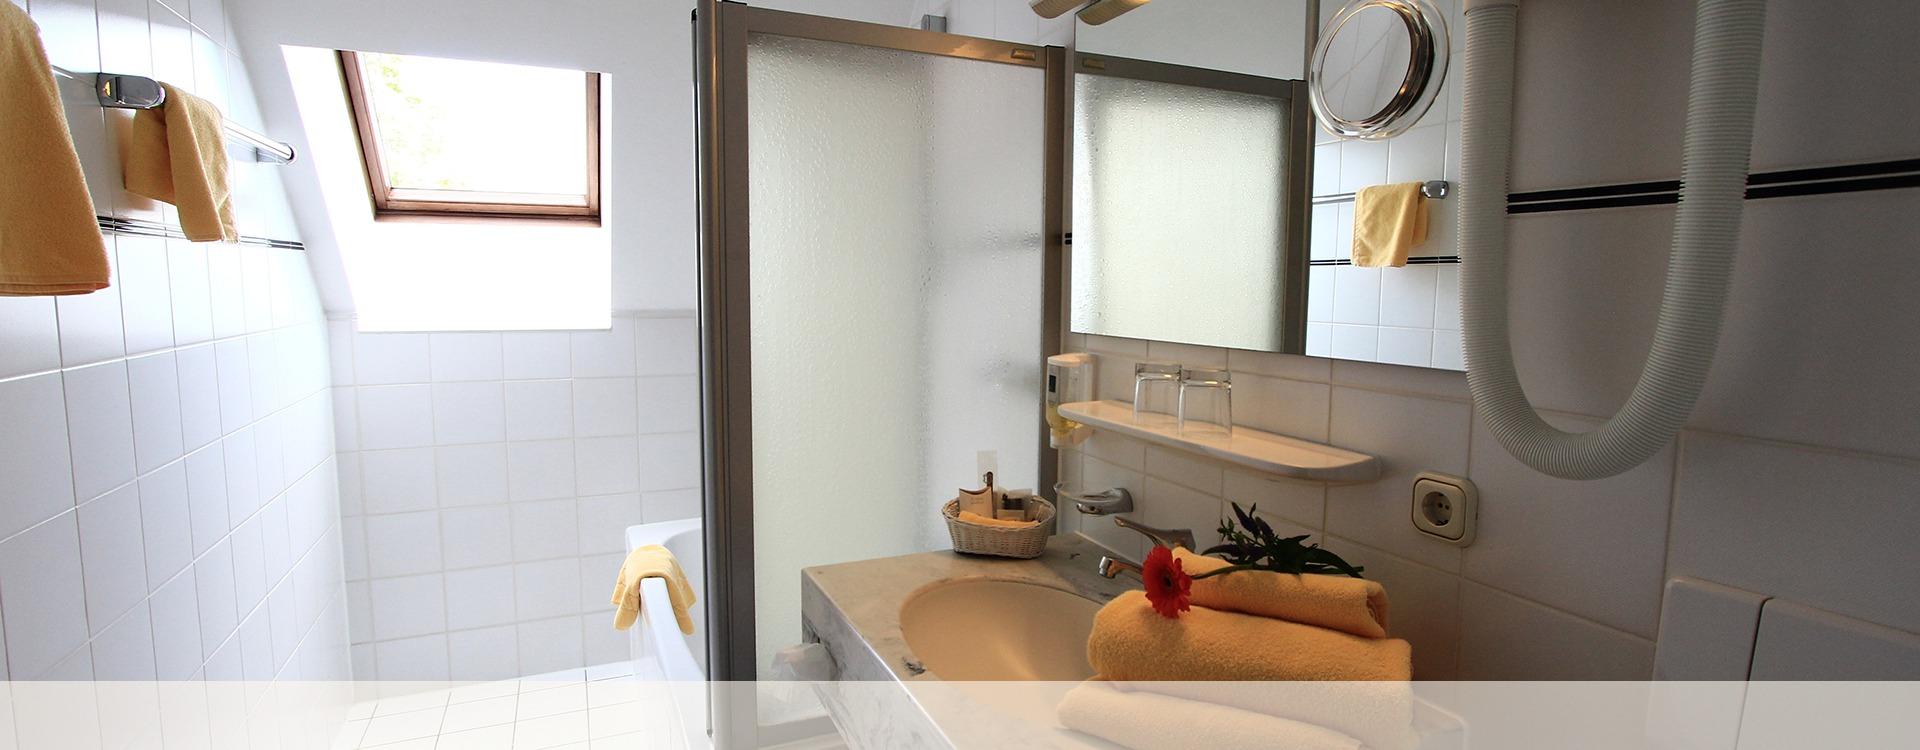 Hotel Eichenau Badezimmer